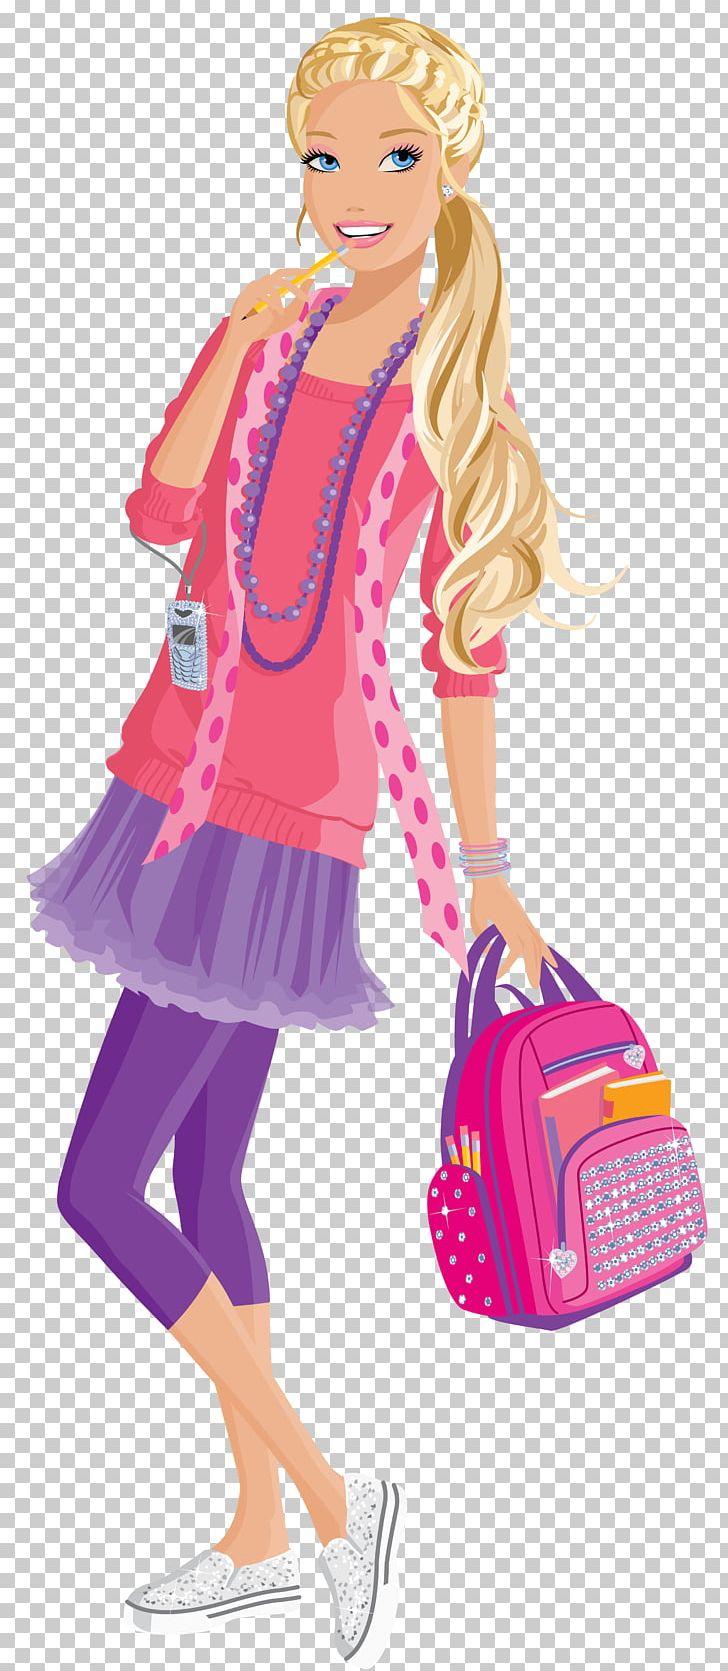 Barbie: The Princess & The Popstar Doll PNG, Clipart, Art, Barbie.